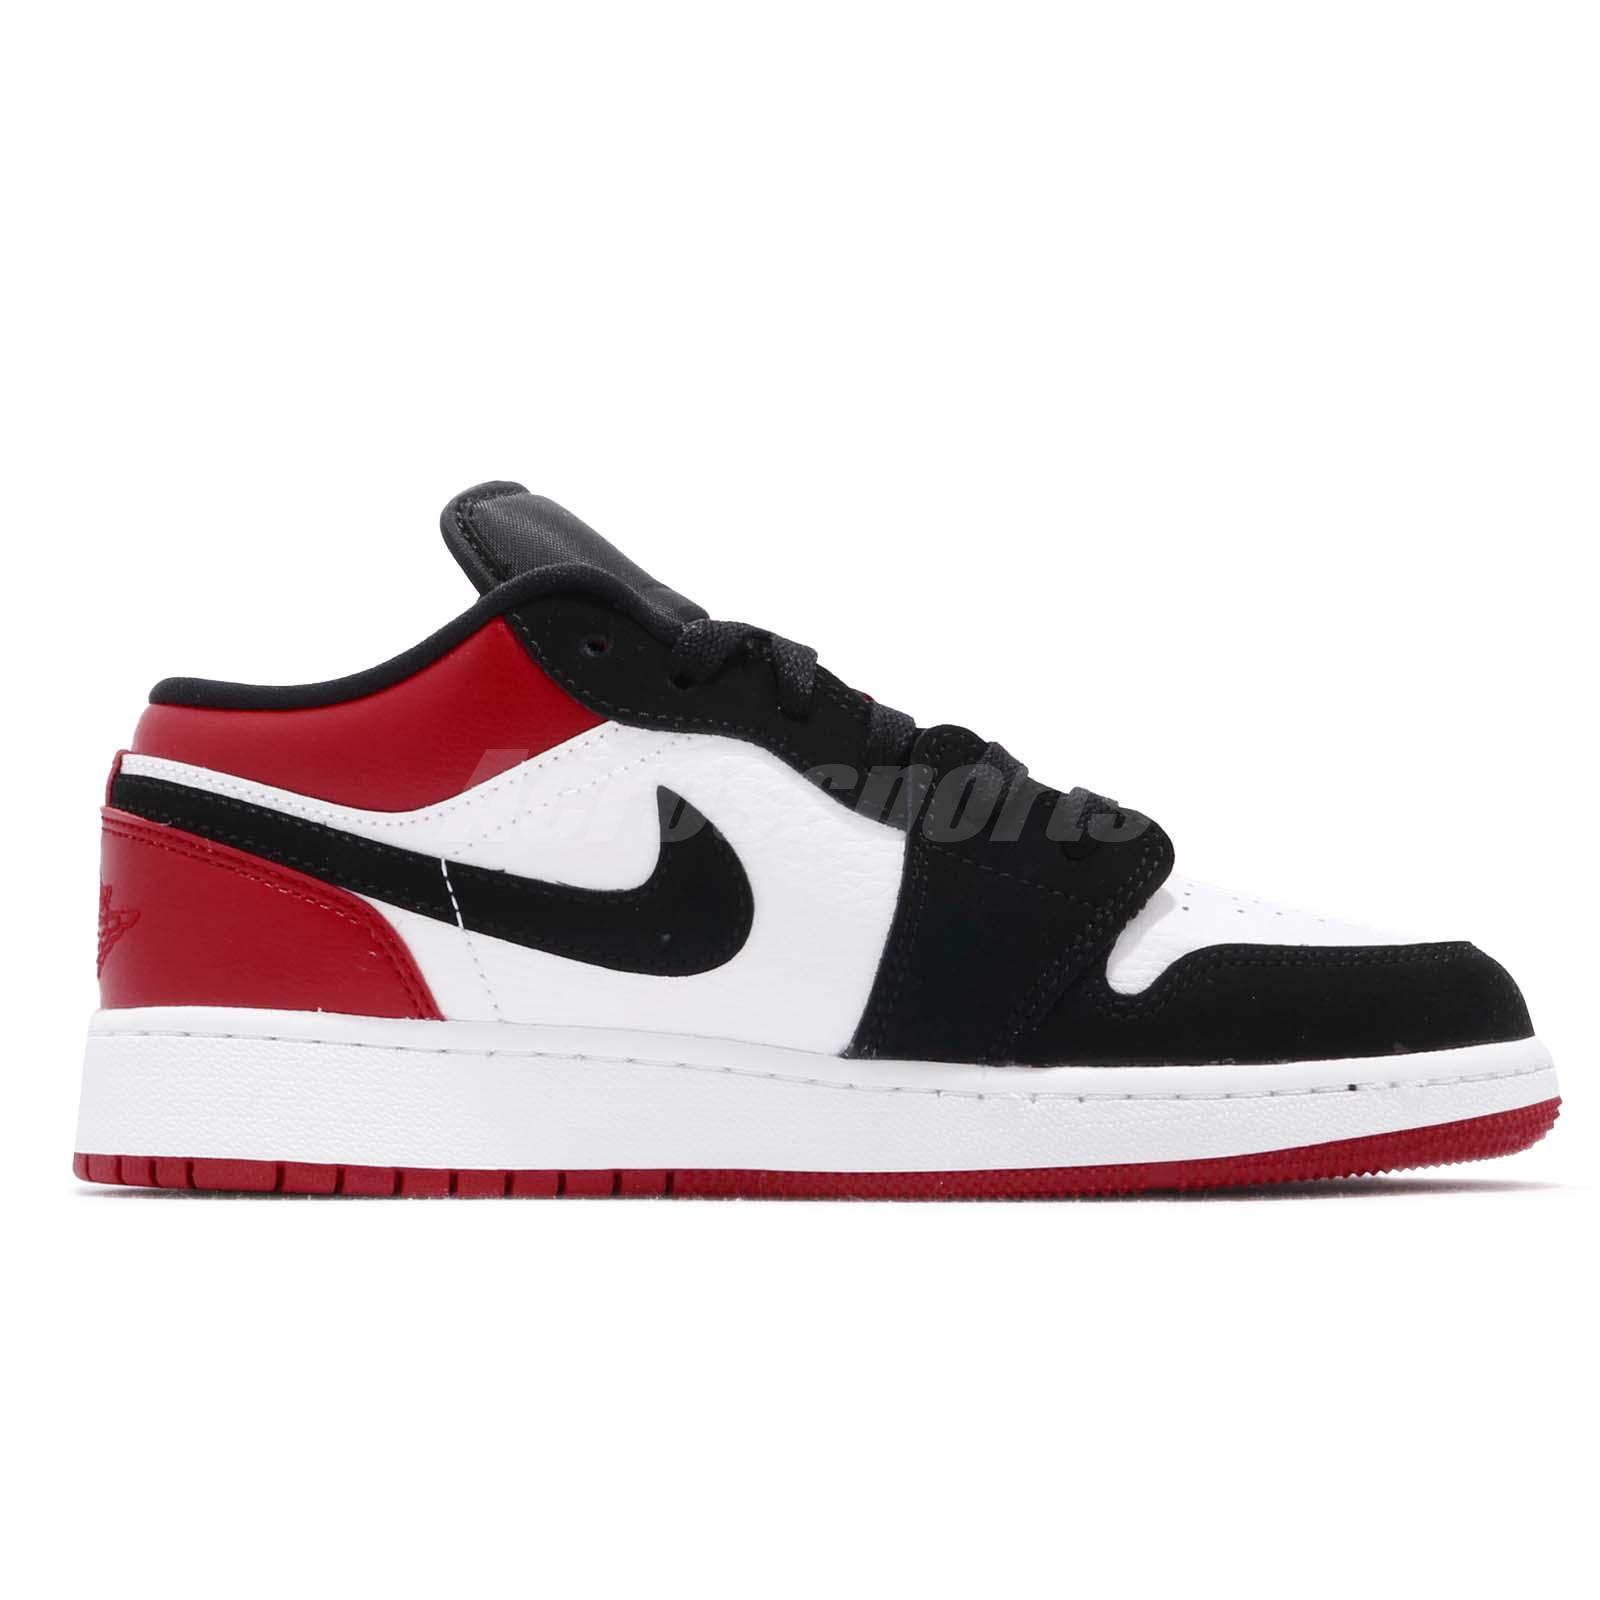 finest selection 29968 5be7c Details about Nike Air Jordan 1 Low GS I AJ1 Black Toe Kid Youth Women Shoe  Sneaker 553560-116